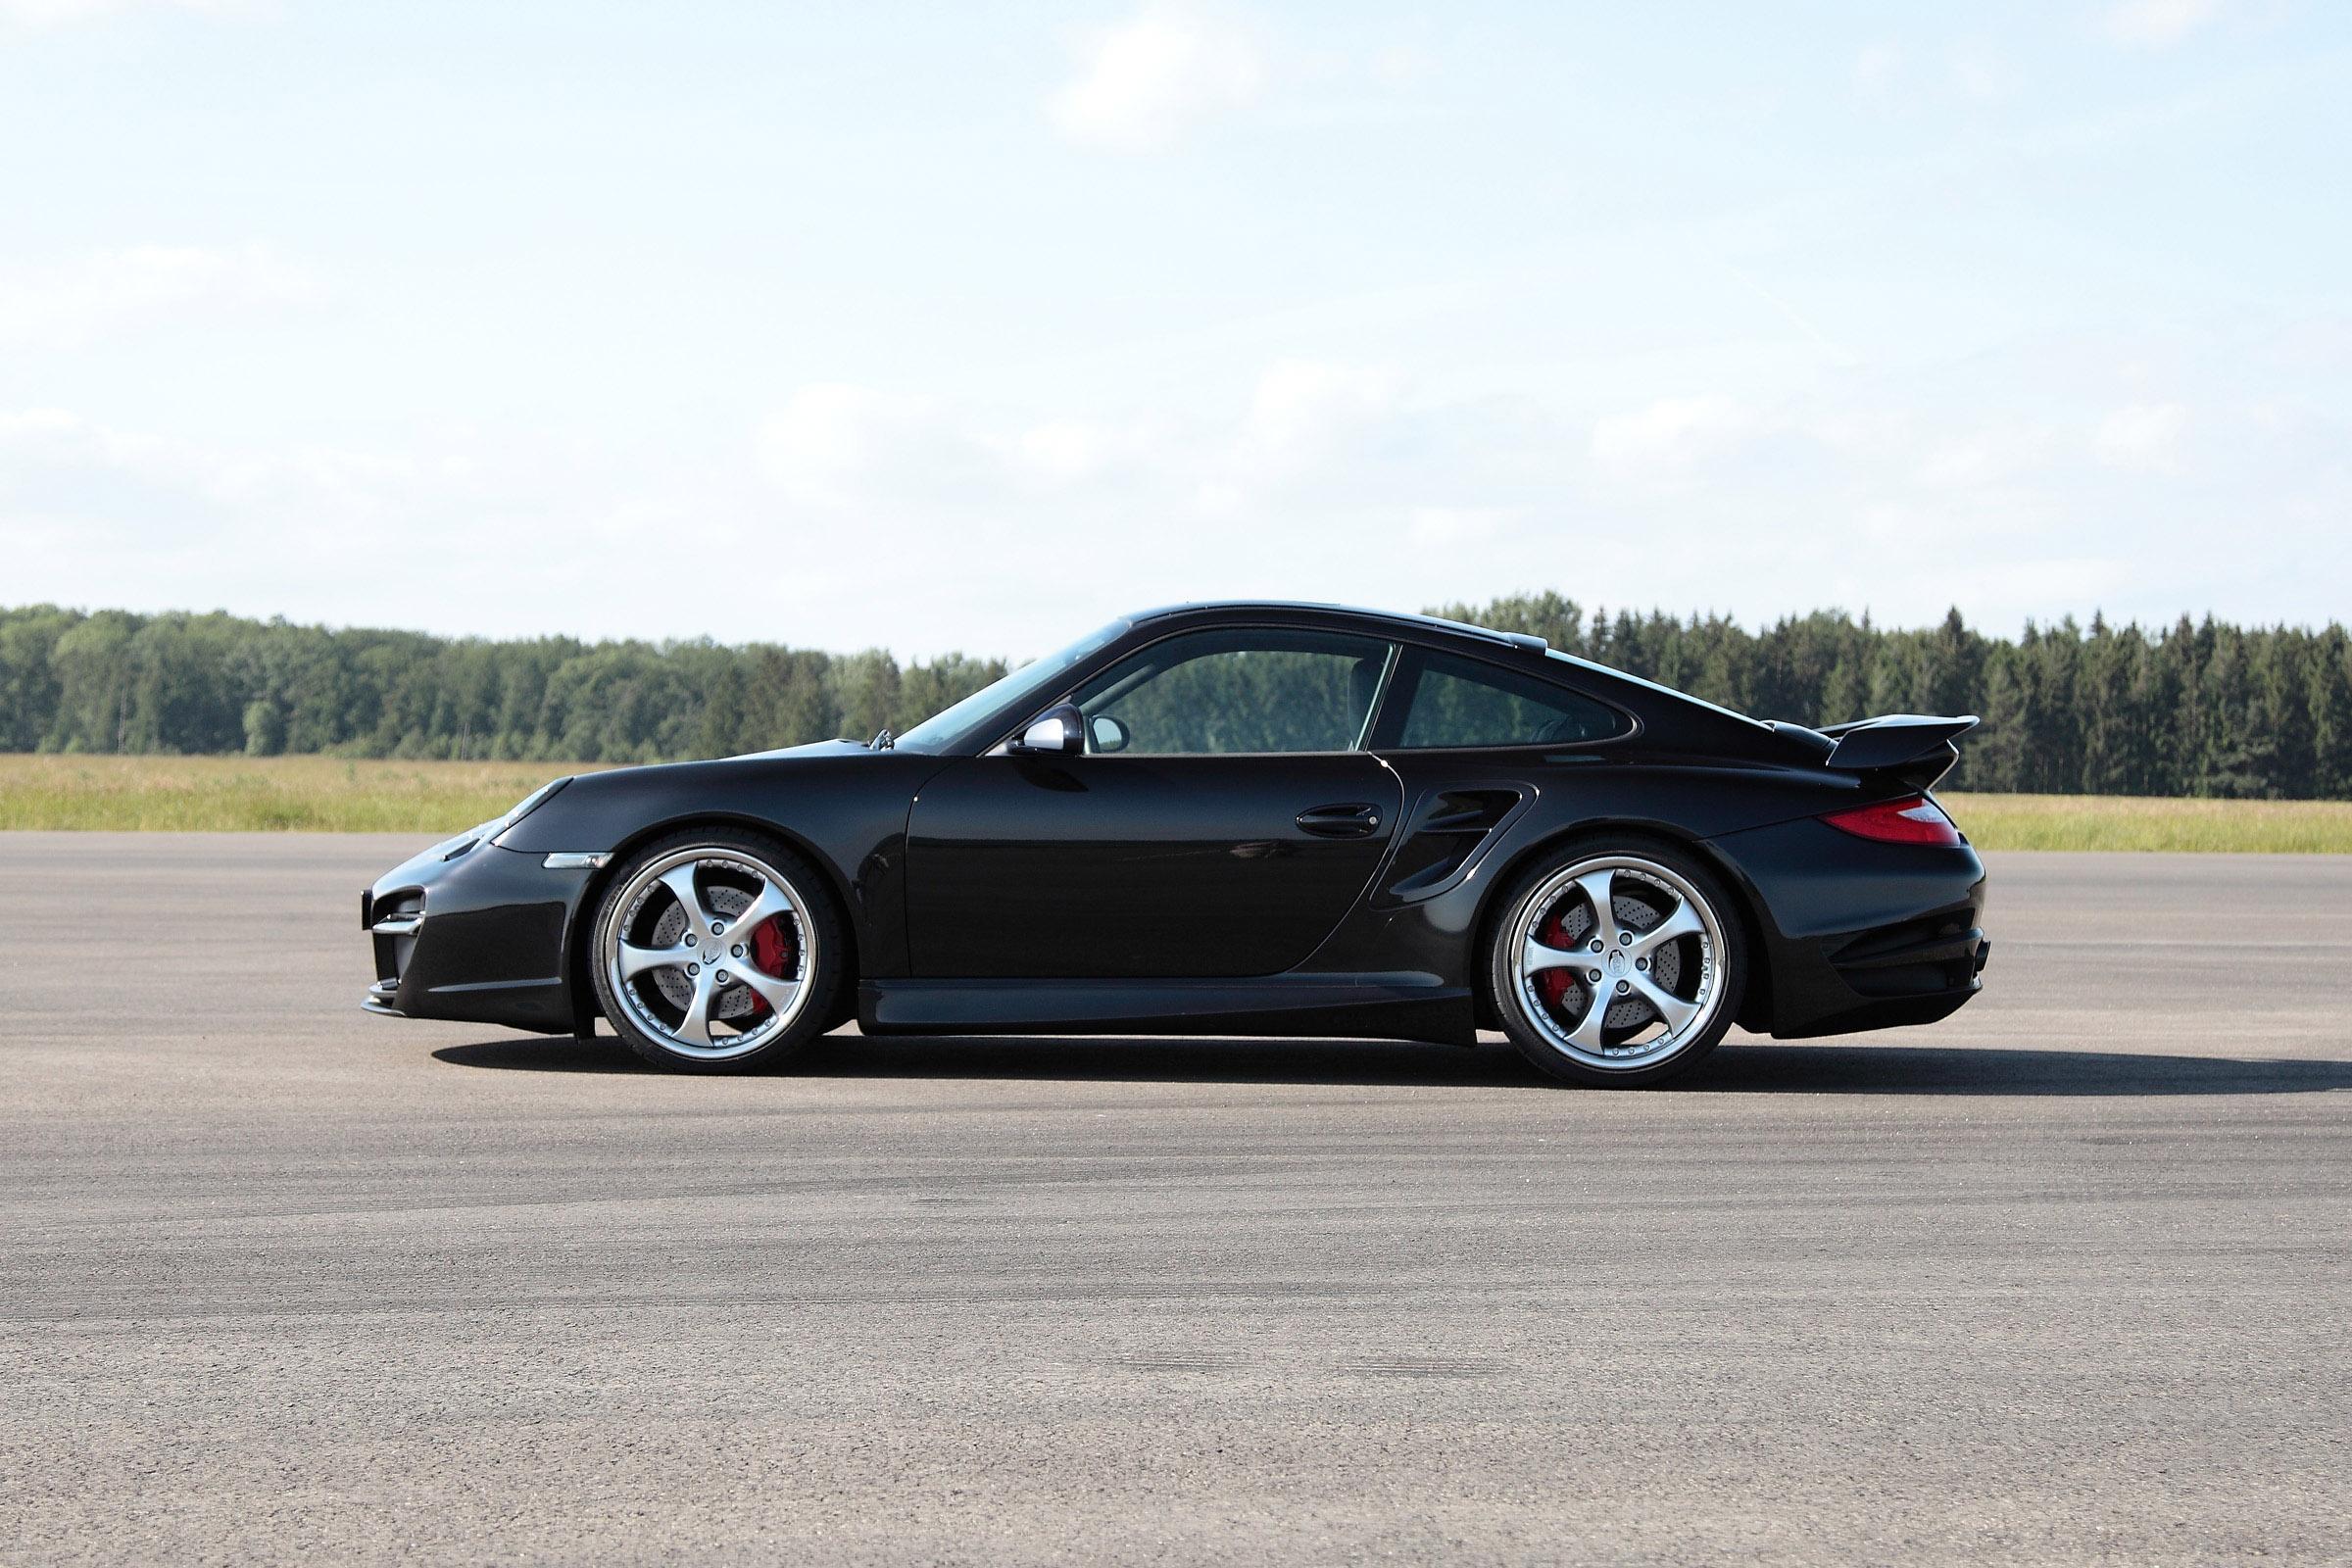 TECHART Porsche 911 Turbo Aerodynamic Kit 2 - Picture 37395